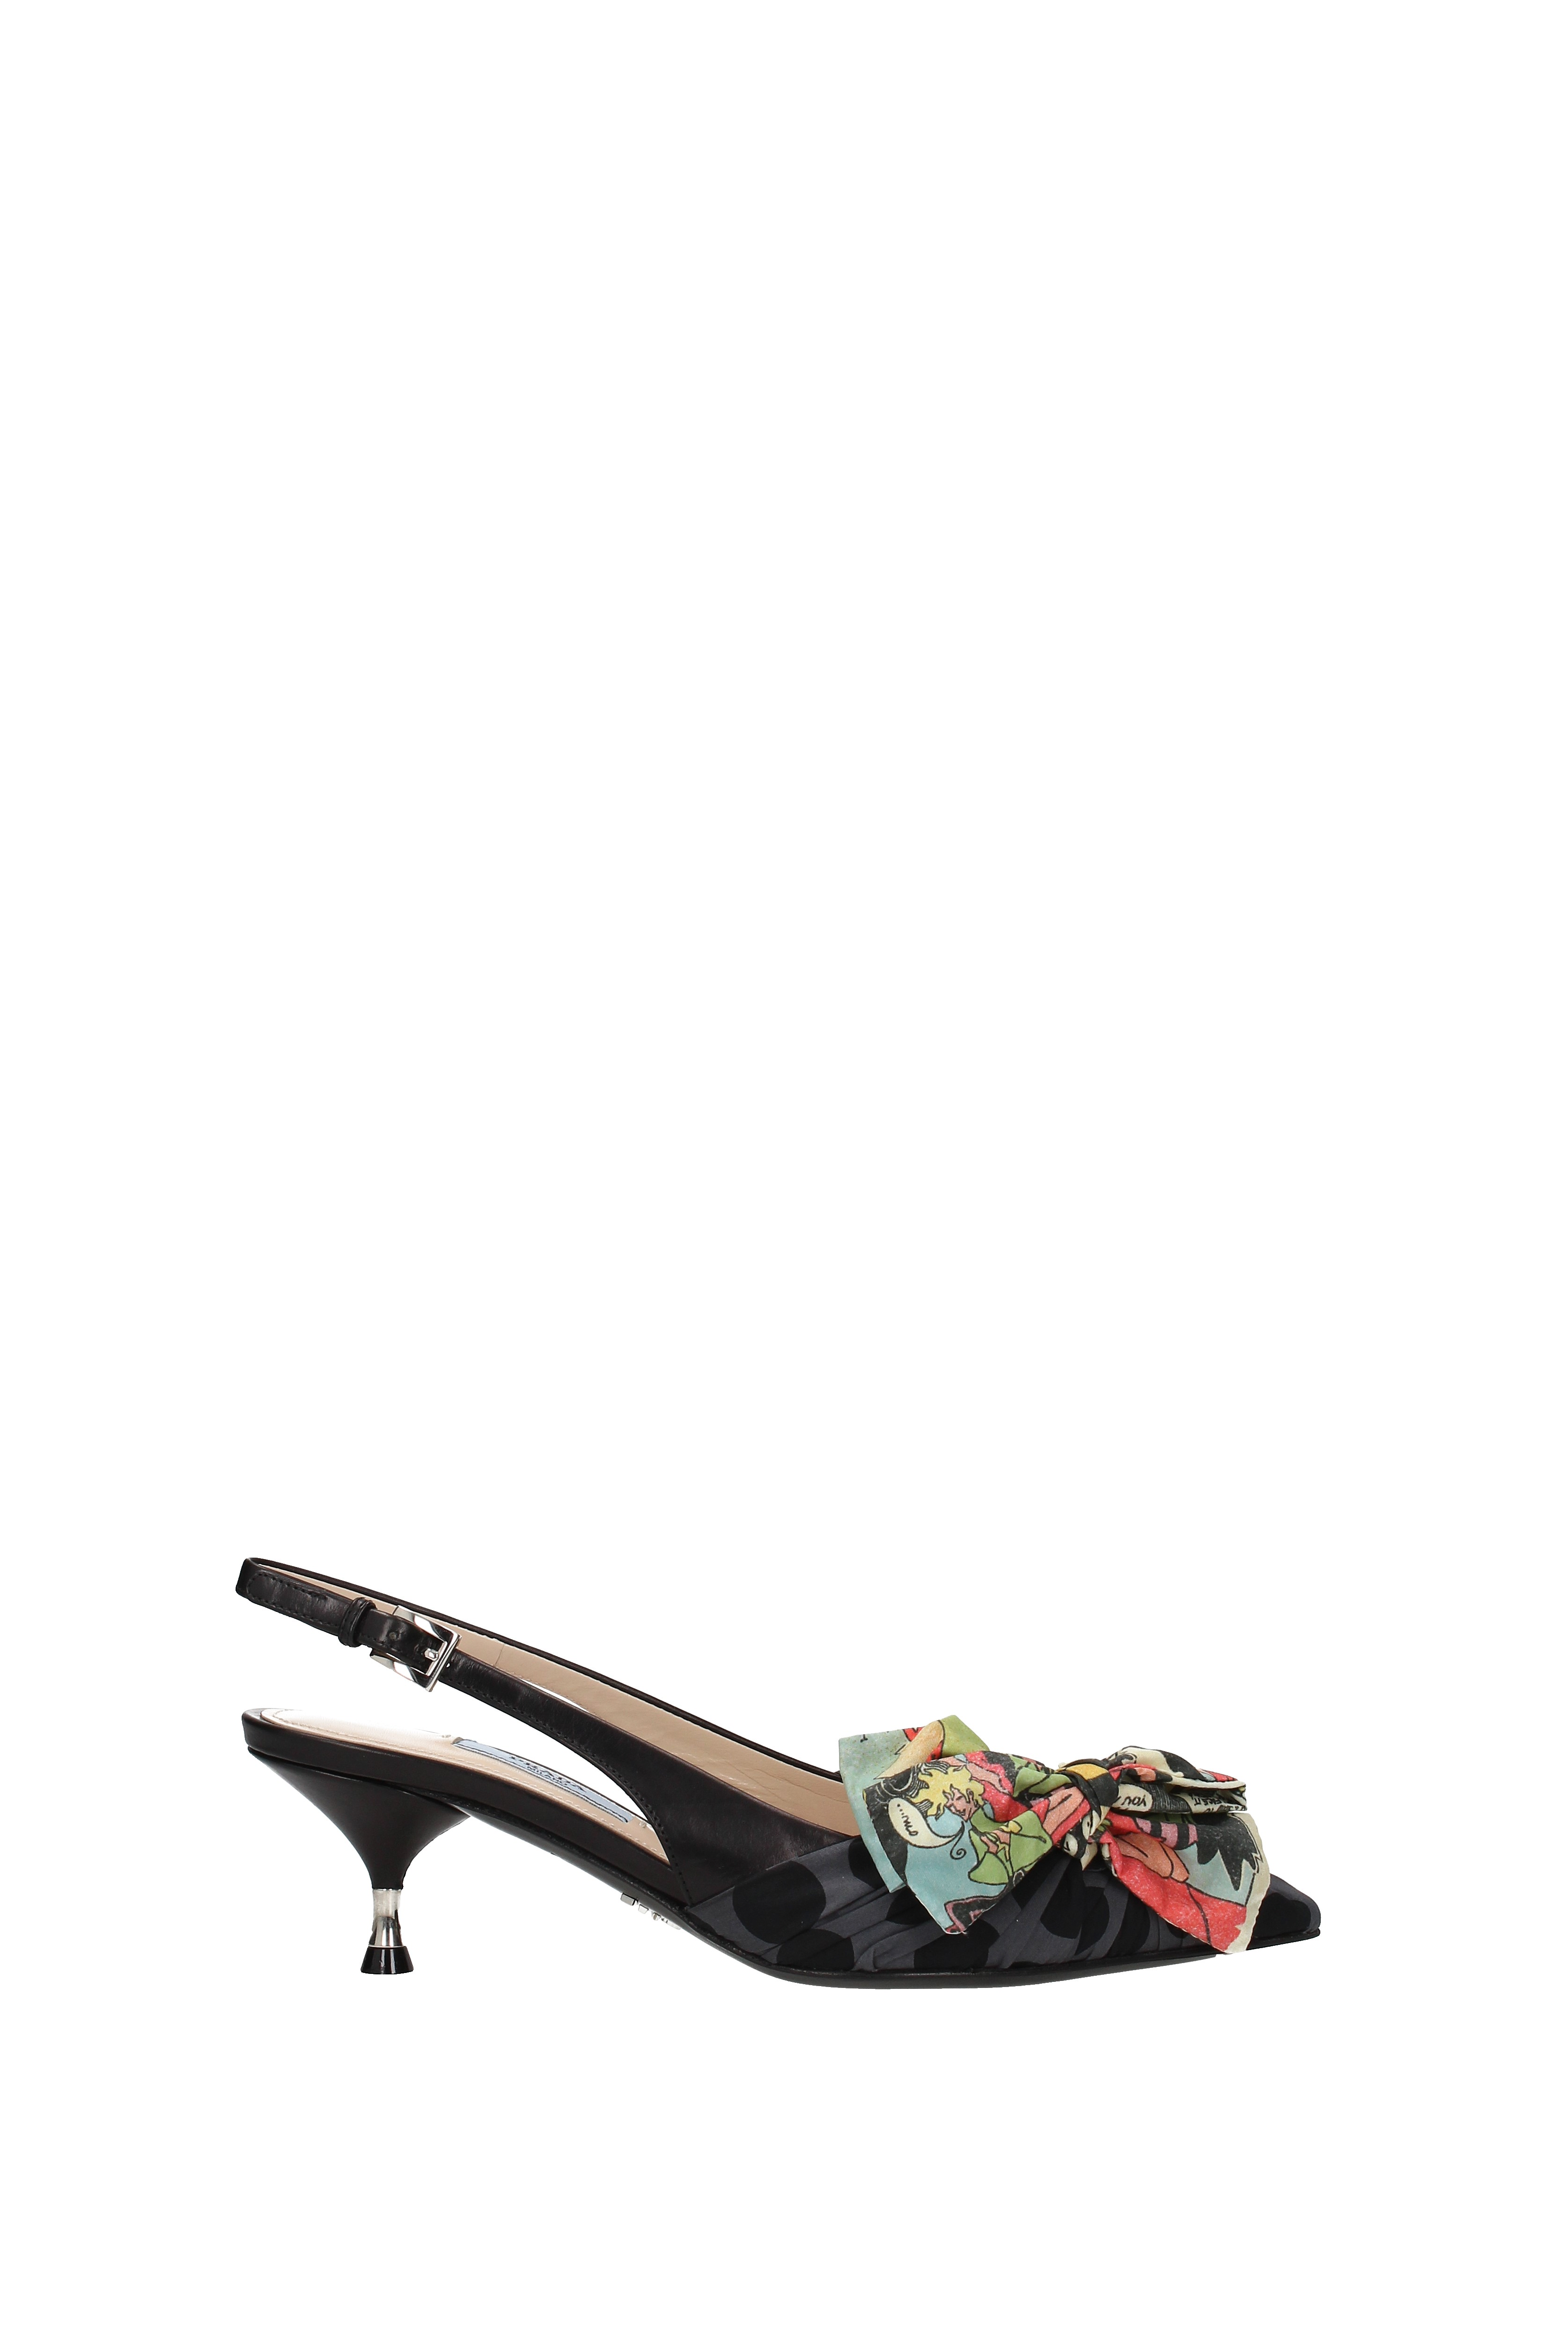 Sandalias Prada i señora-sustancia (1 i Prada 690 istpoisvitello) c5ed68